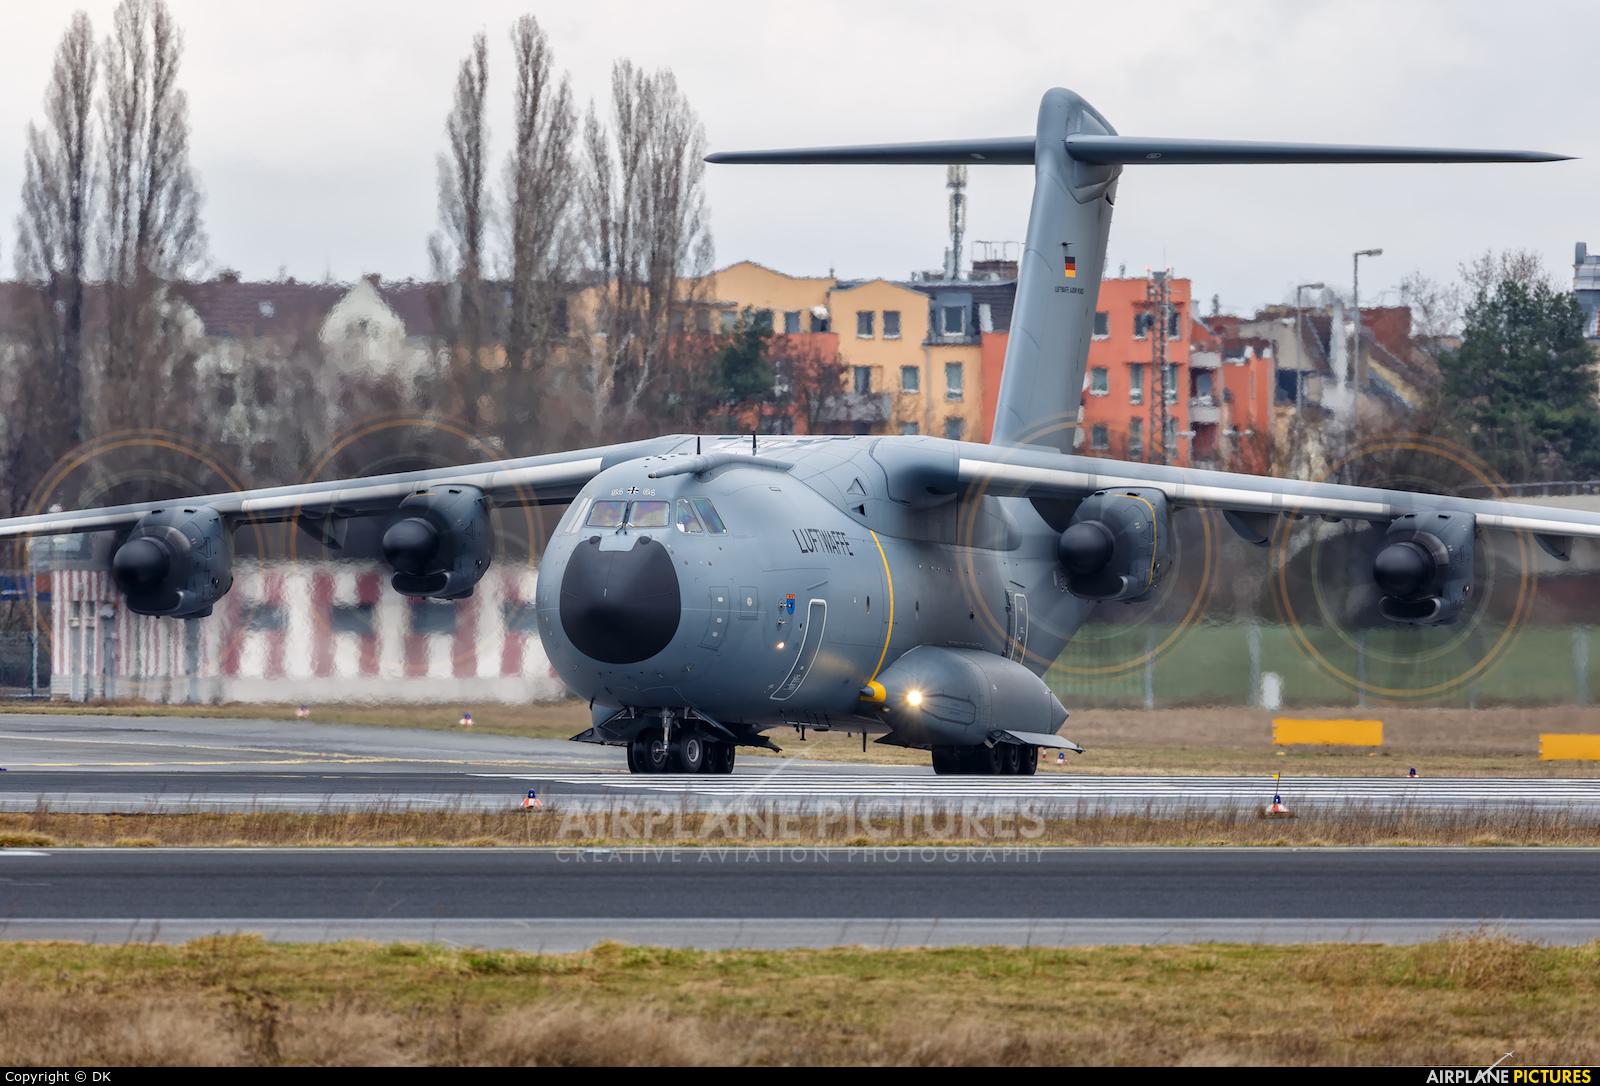 Germany - Air Force 54+04 aircraft at Berlin - Tegel